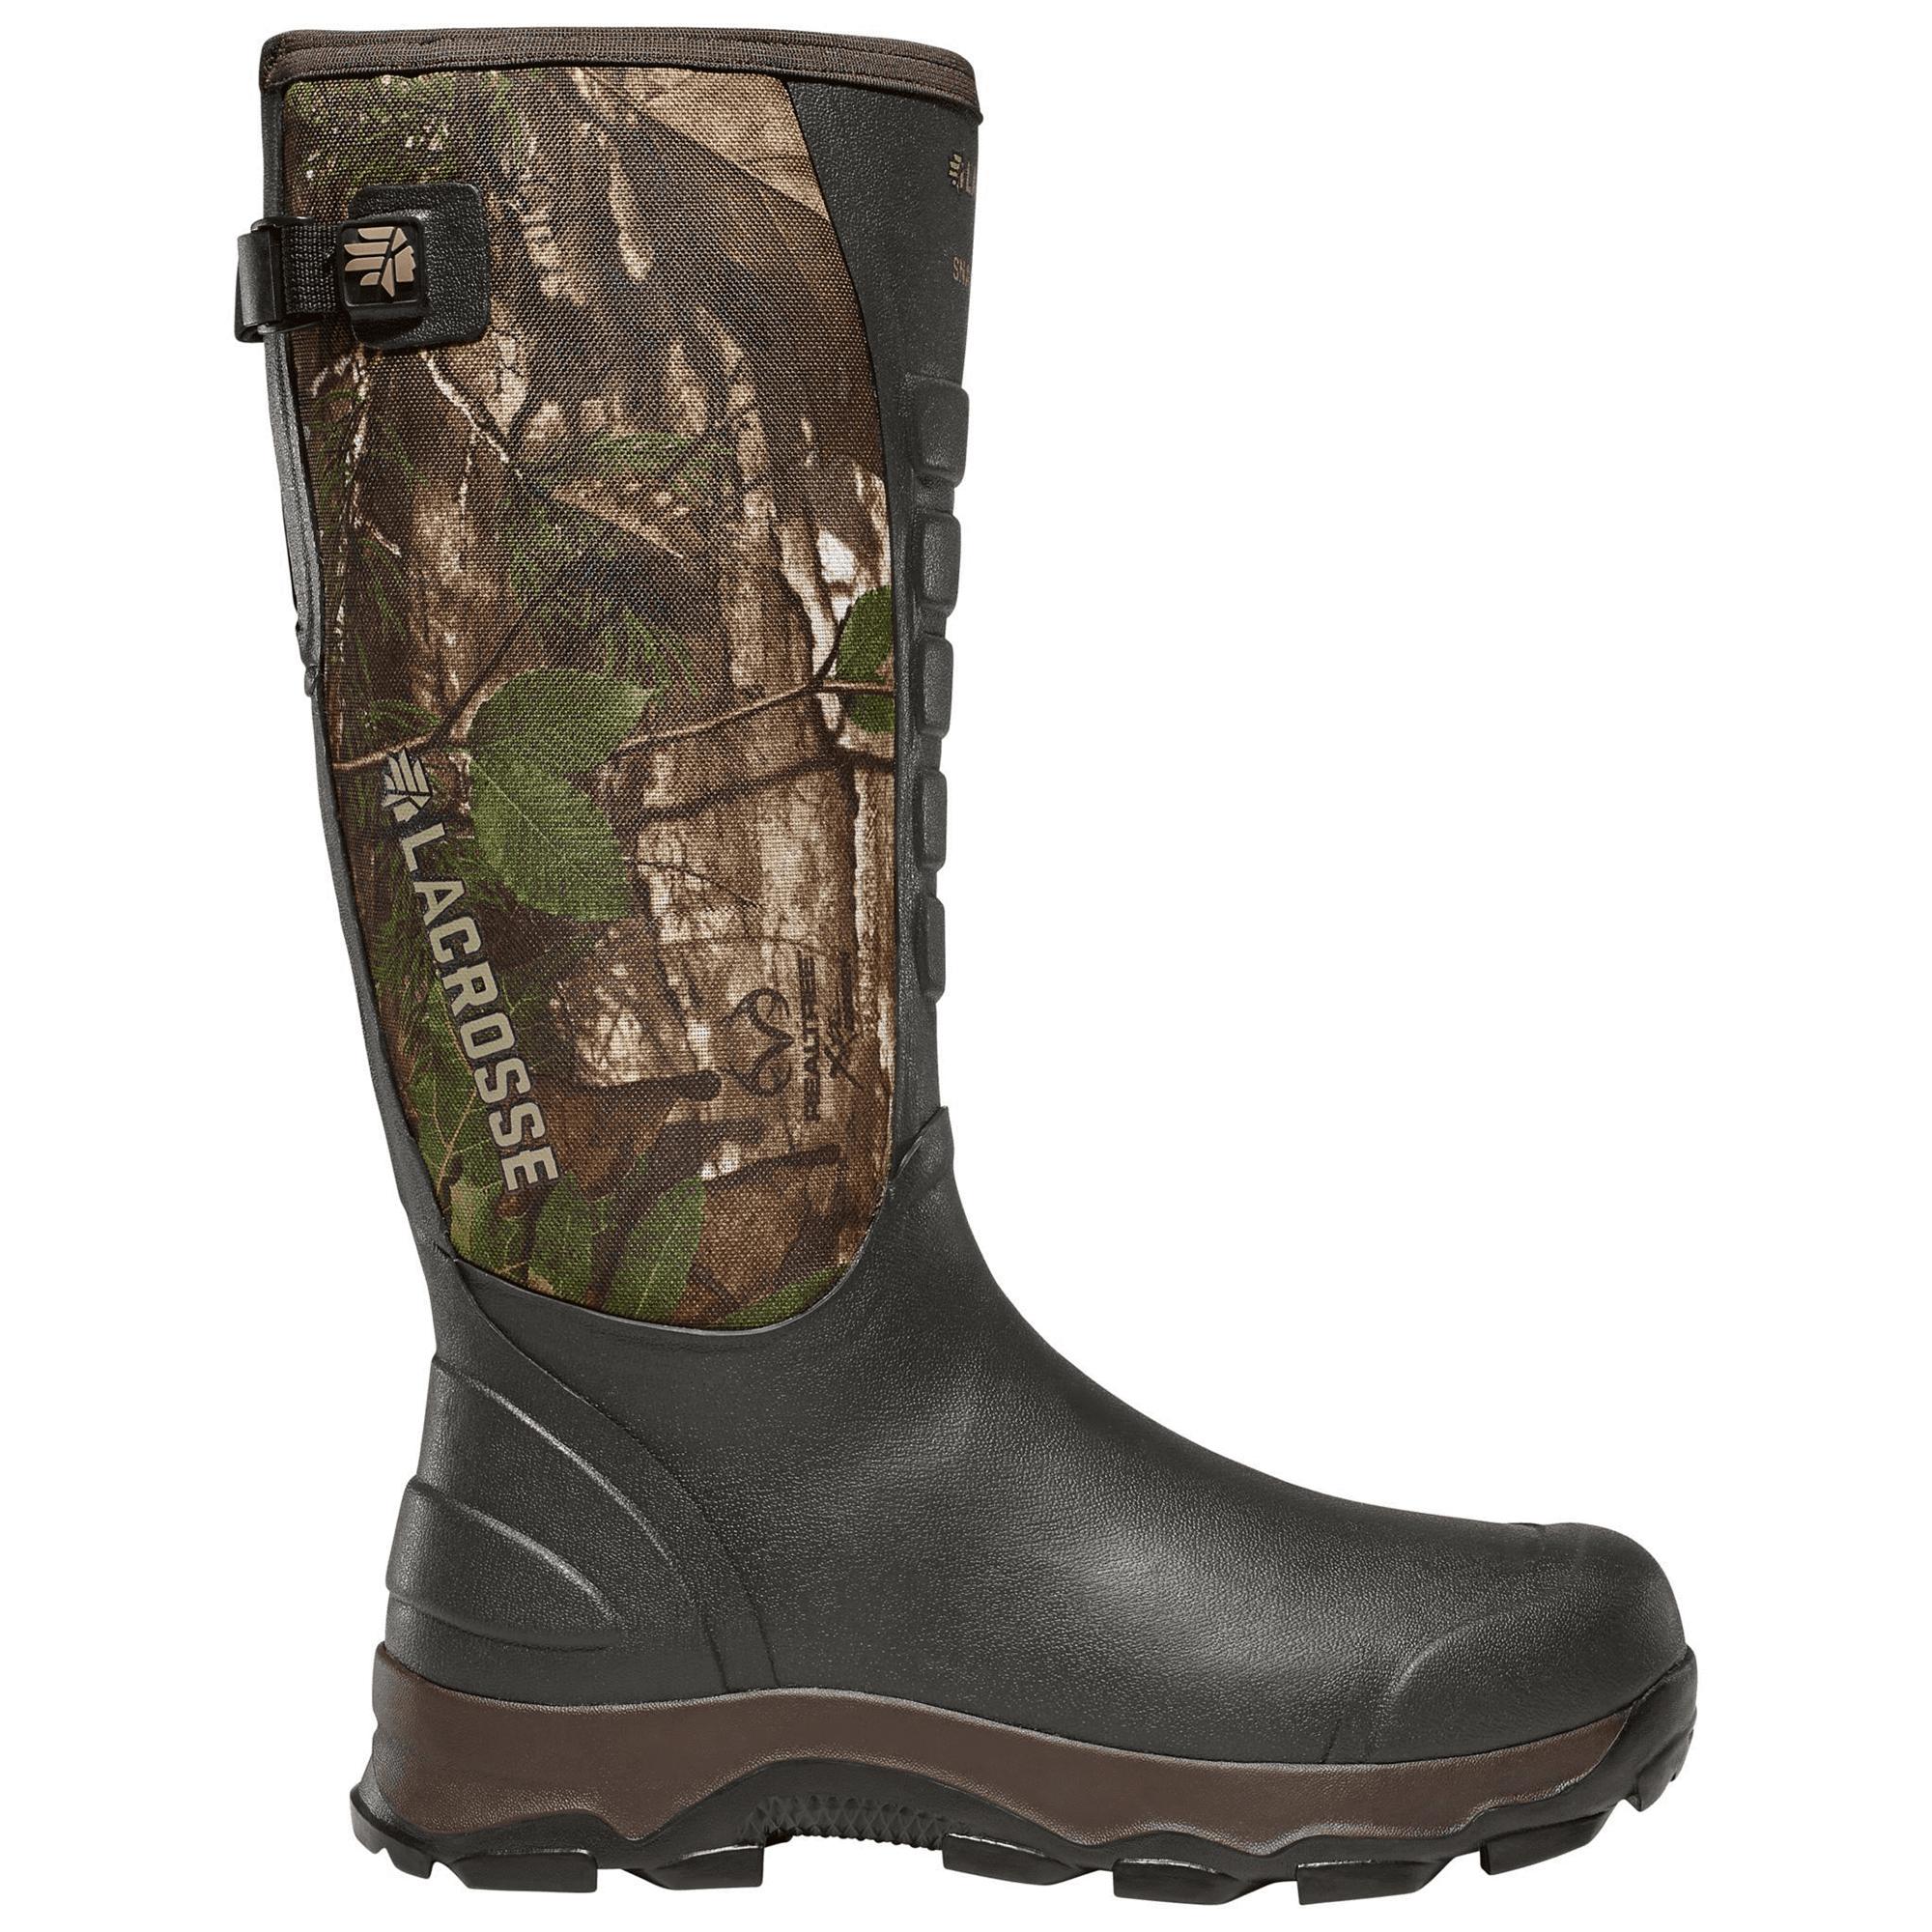 LaCrosse Men's 4xAlpha 16″ Snake Boot, Realtree Xtra Green Camo